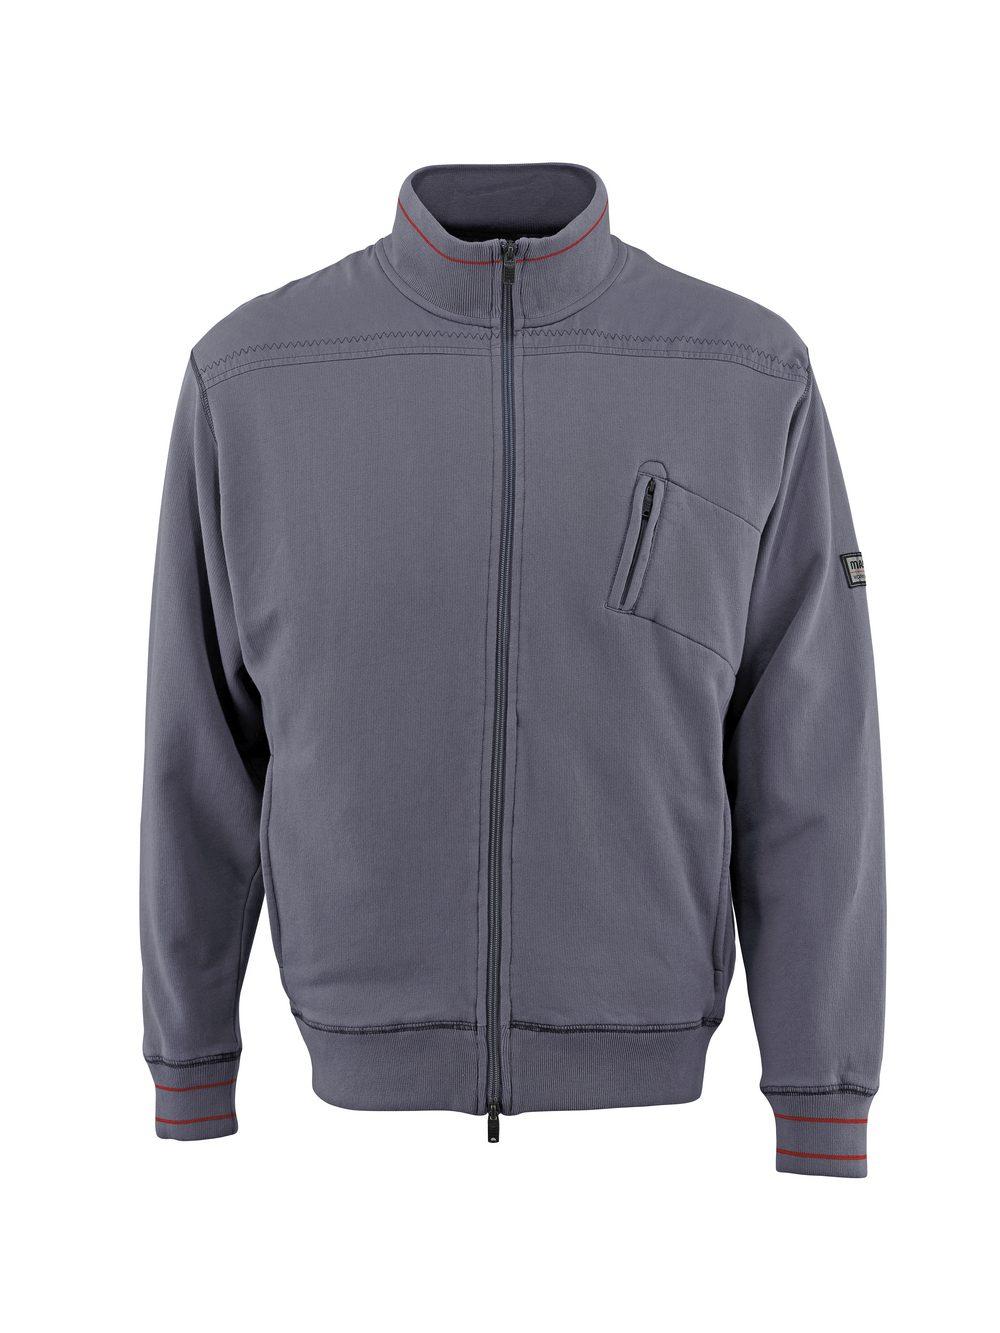 MASCOT Chania Zipped Sweatshirt